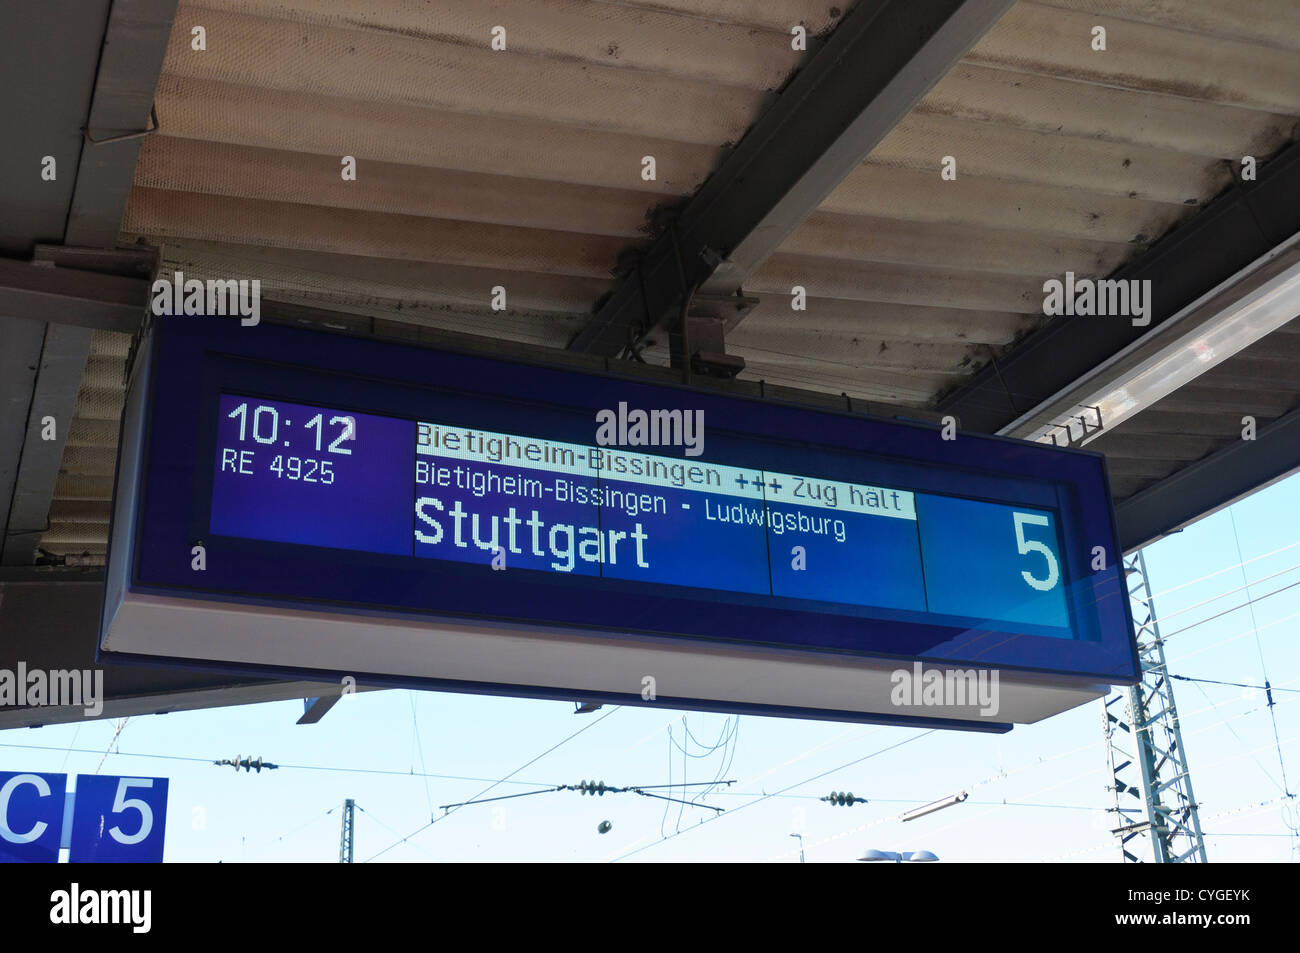 Train stationannunciator panel - Stock Image